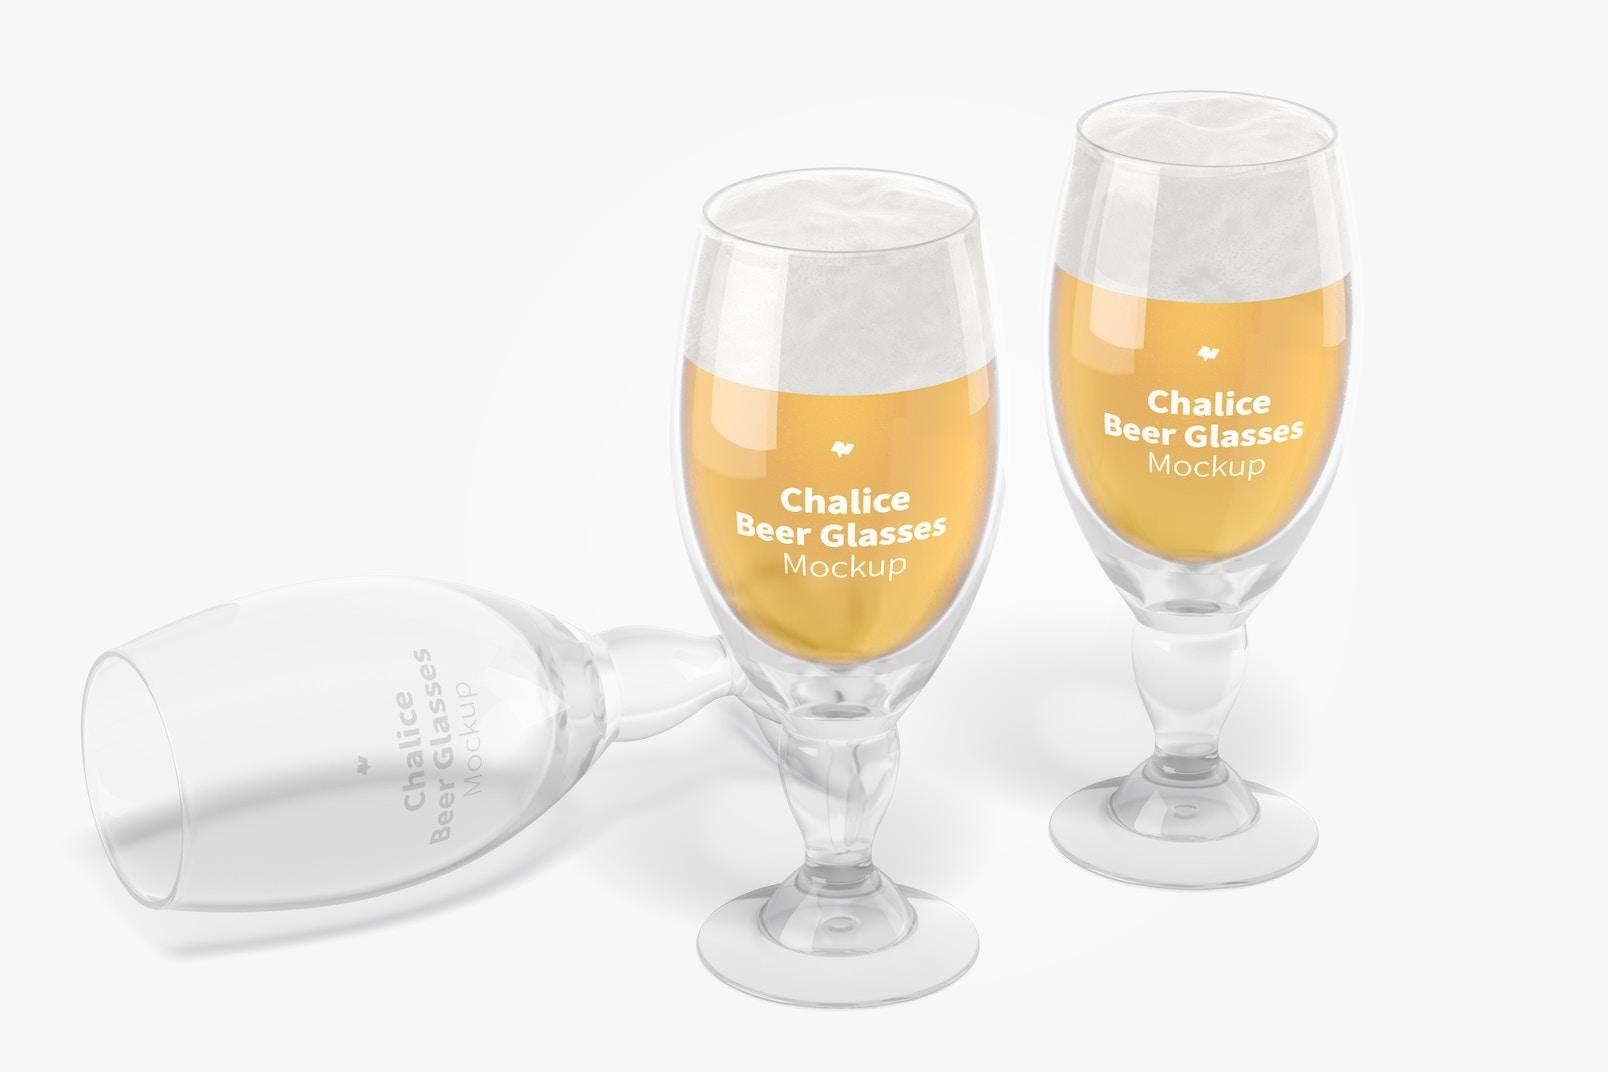 Chalice Beer Glasses Mockup